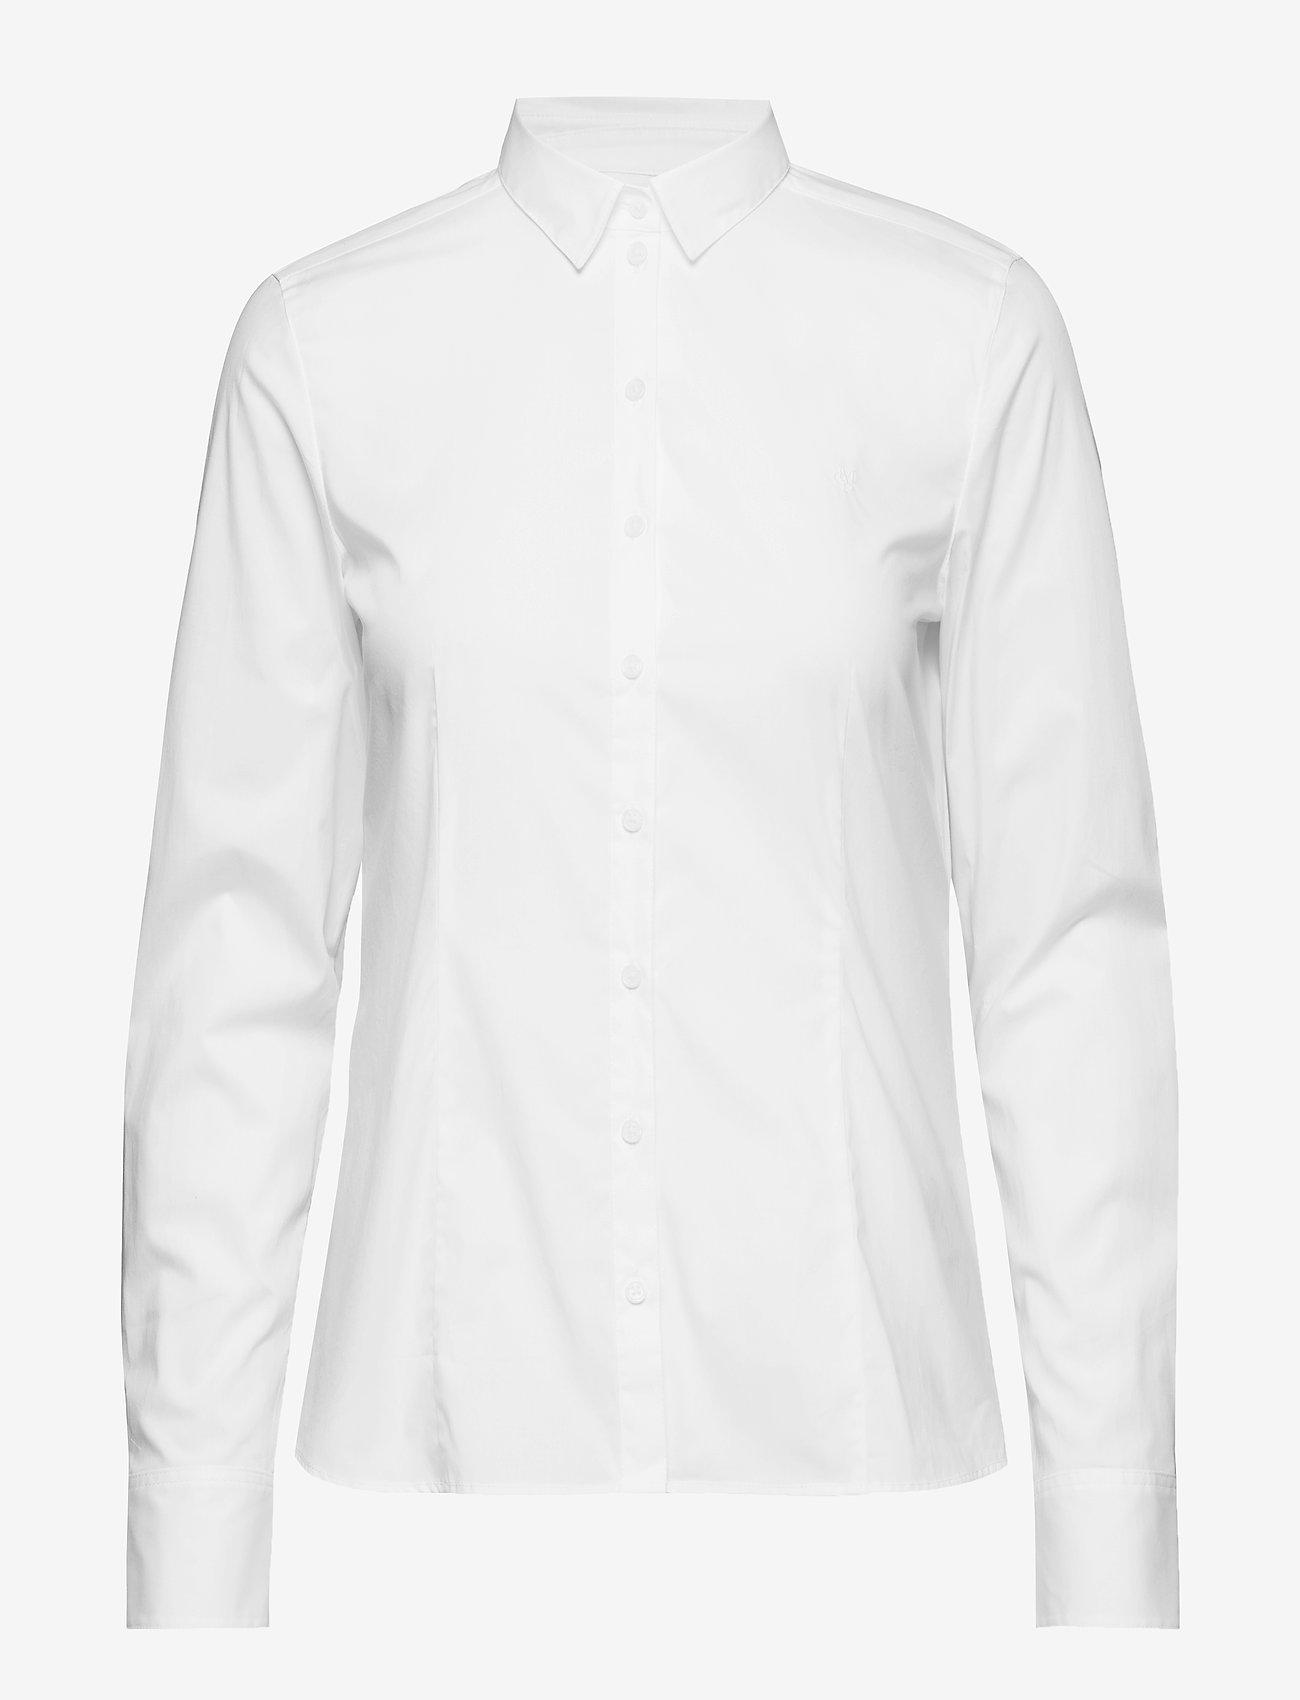 Marc O'Polo - SHIRTS/BLOUSES LONG SLEEVE - langærmede skjorter - white - 0